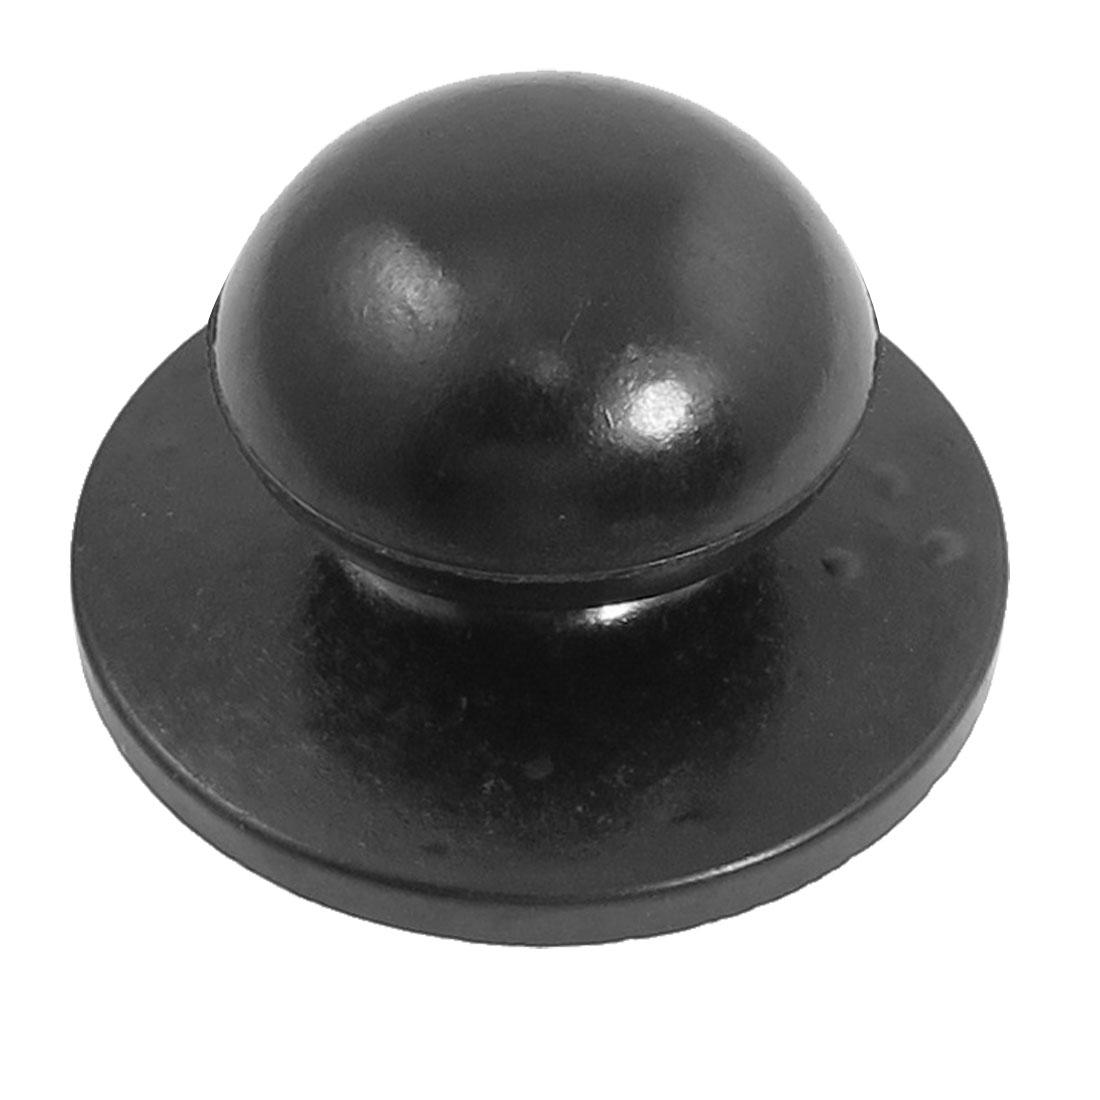 5mm Screw Diameter Black Plastic Cookware Pot Pan Lid Round Knob Replacement